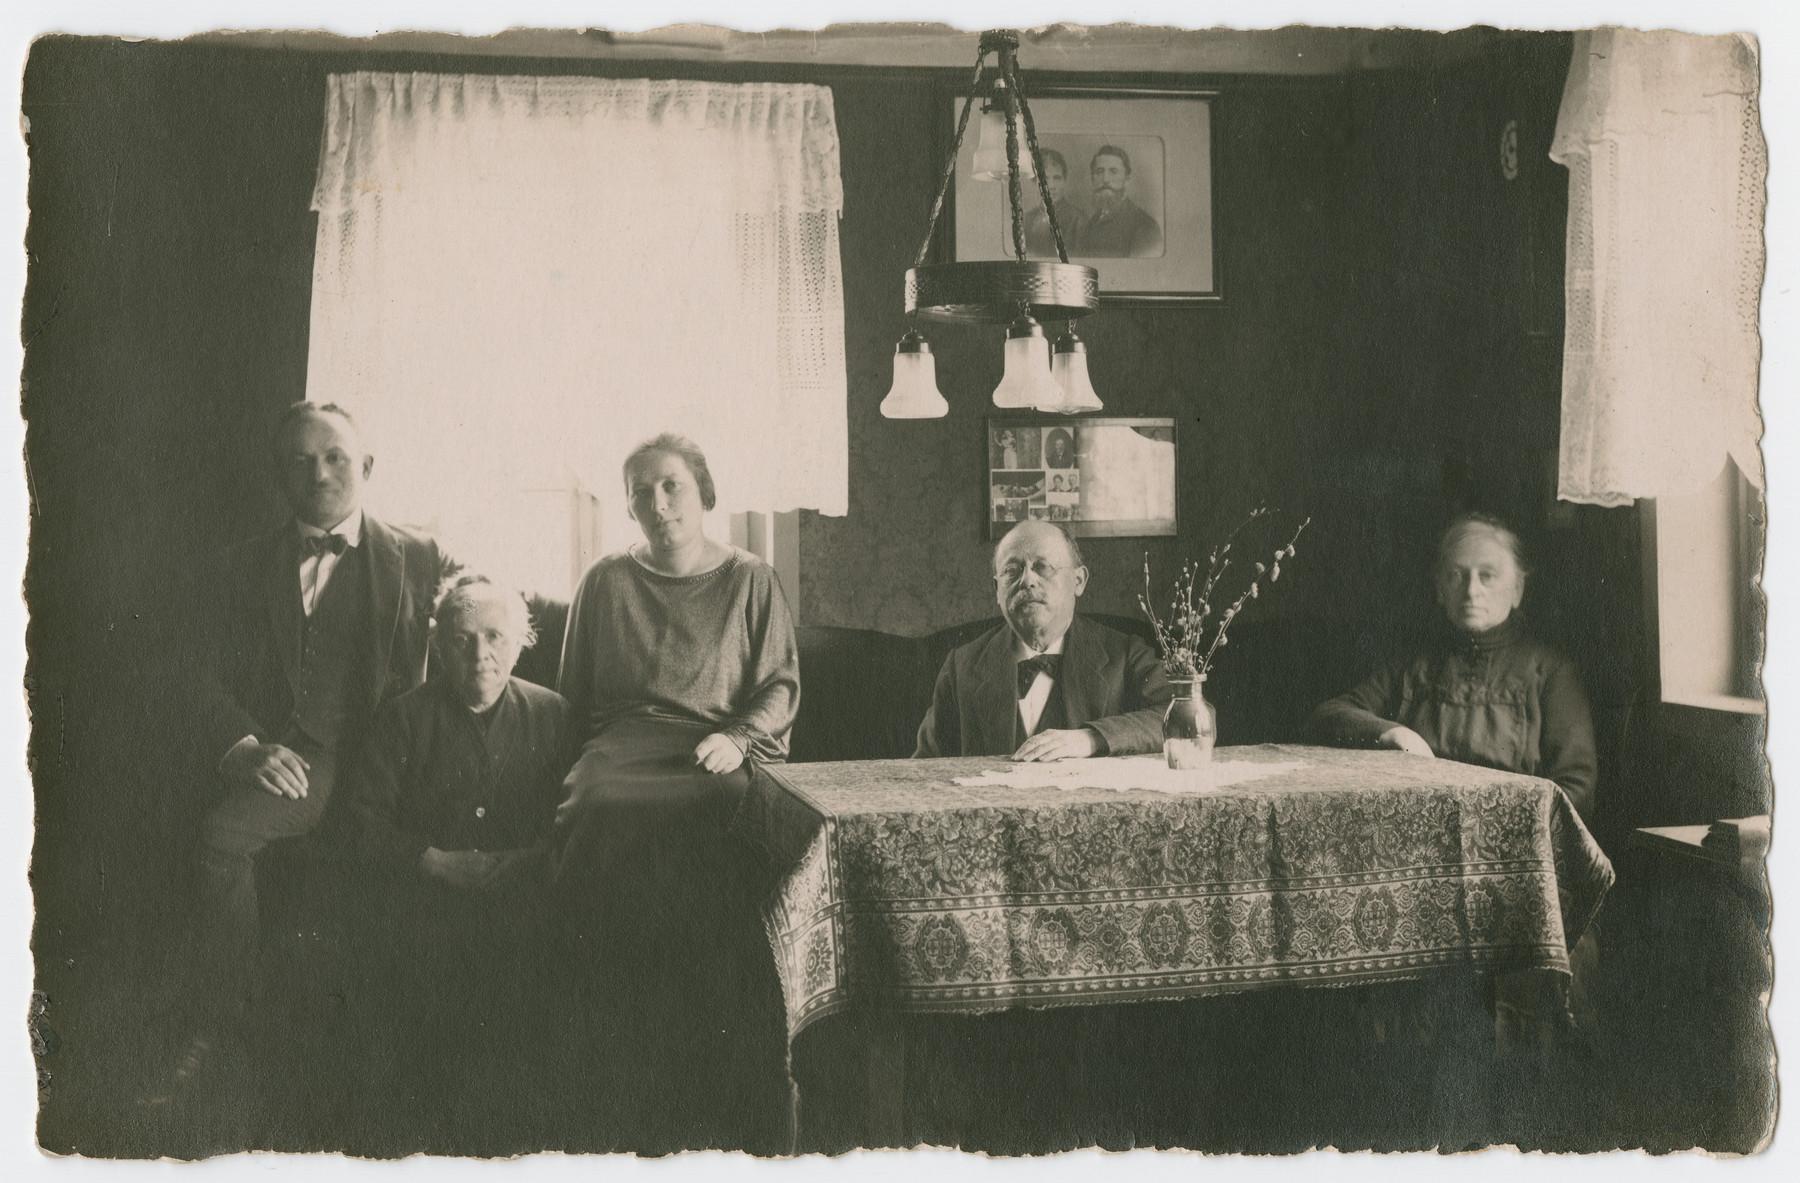 Members of the Isenberg family pose in their living room.  Pictured (L-R): Sigmund Isenberg, Julie Isenberg (her house), Rosa Isenberg, Salomon Stahl, and Rickchen Stahl.